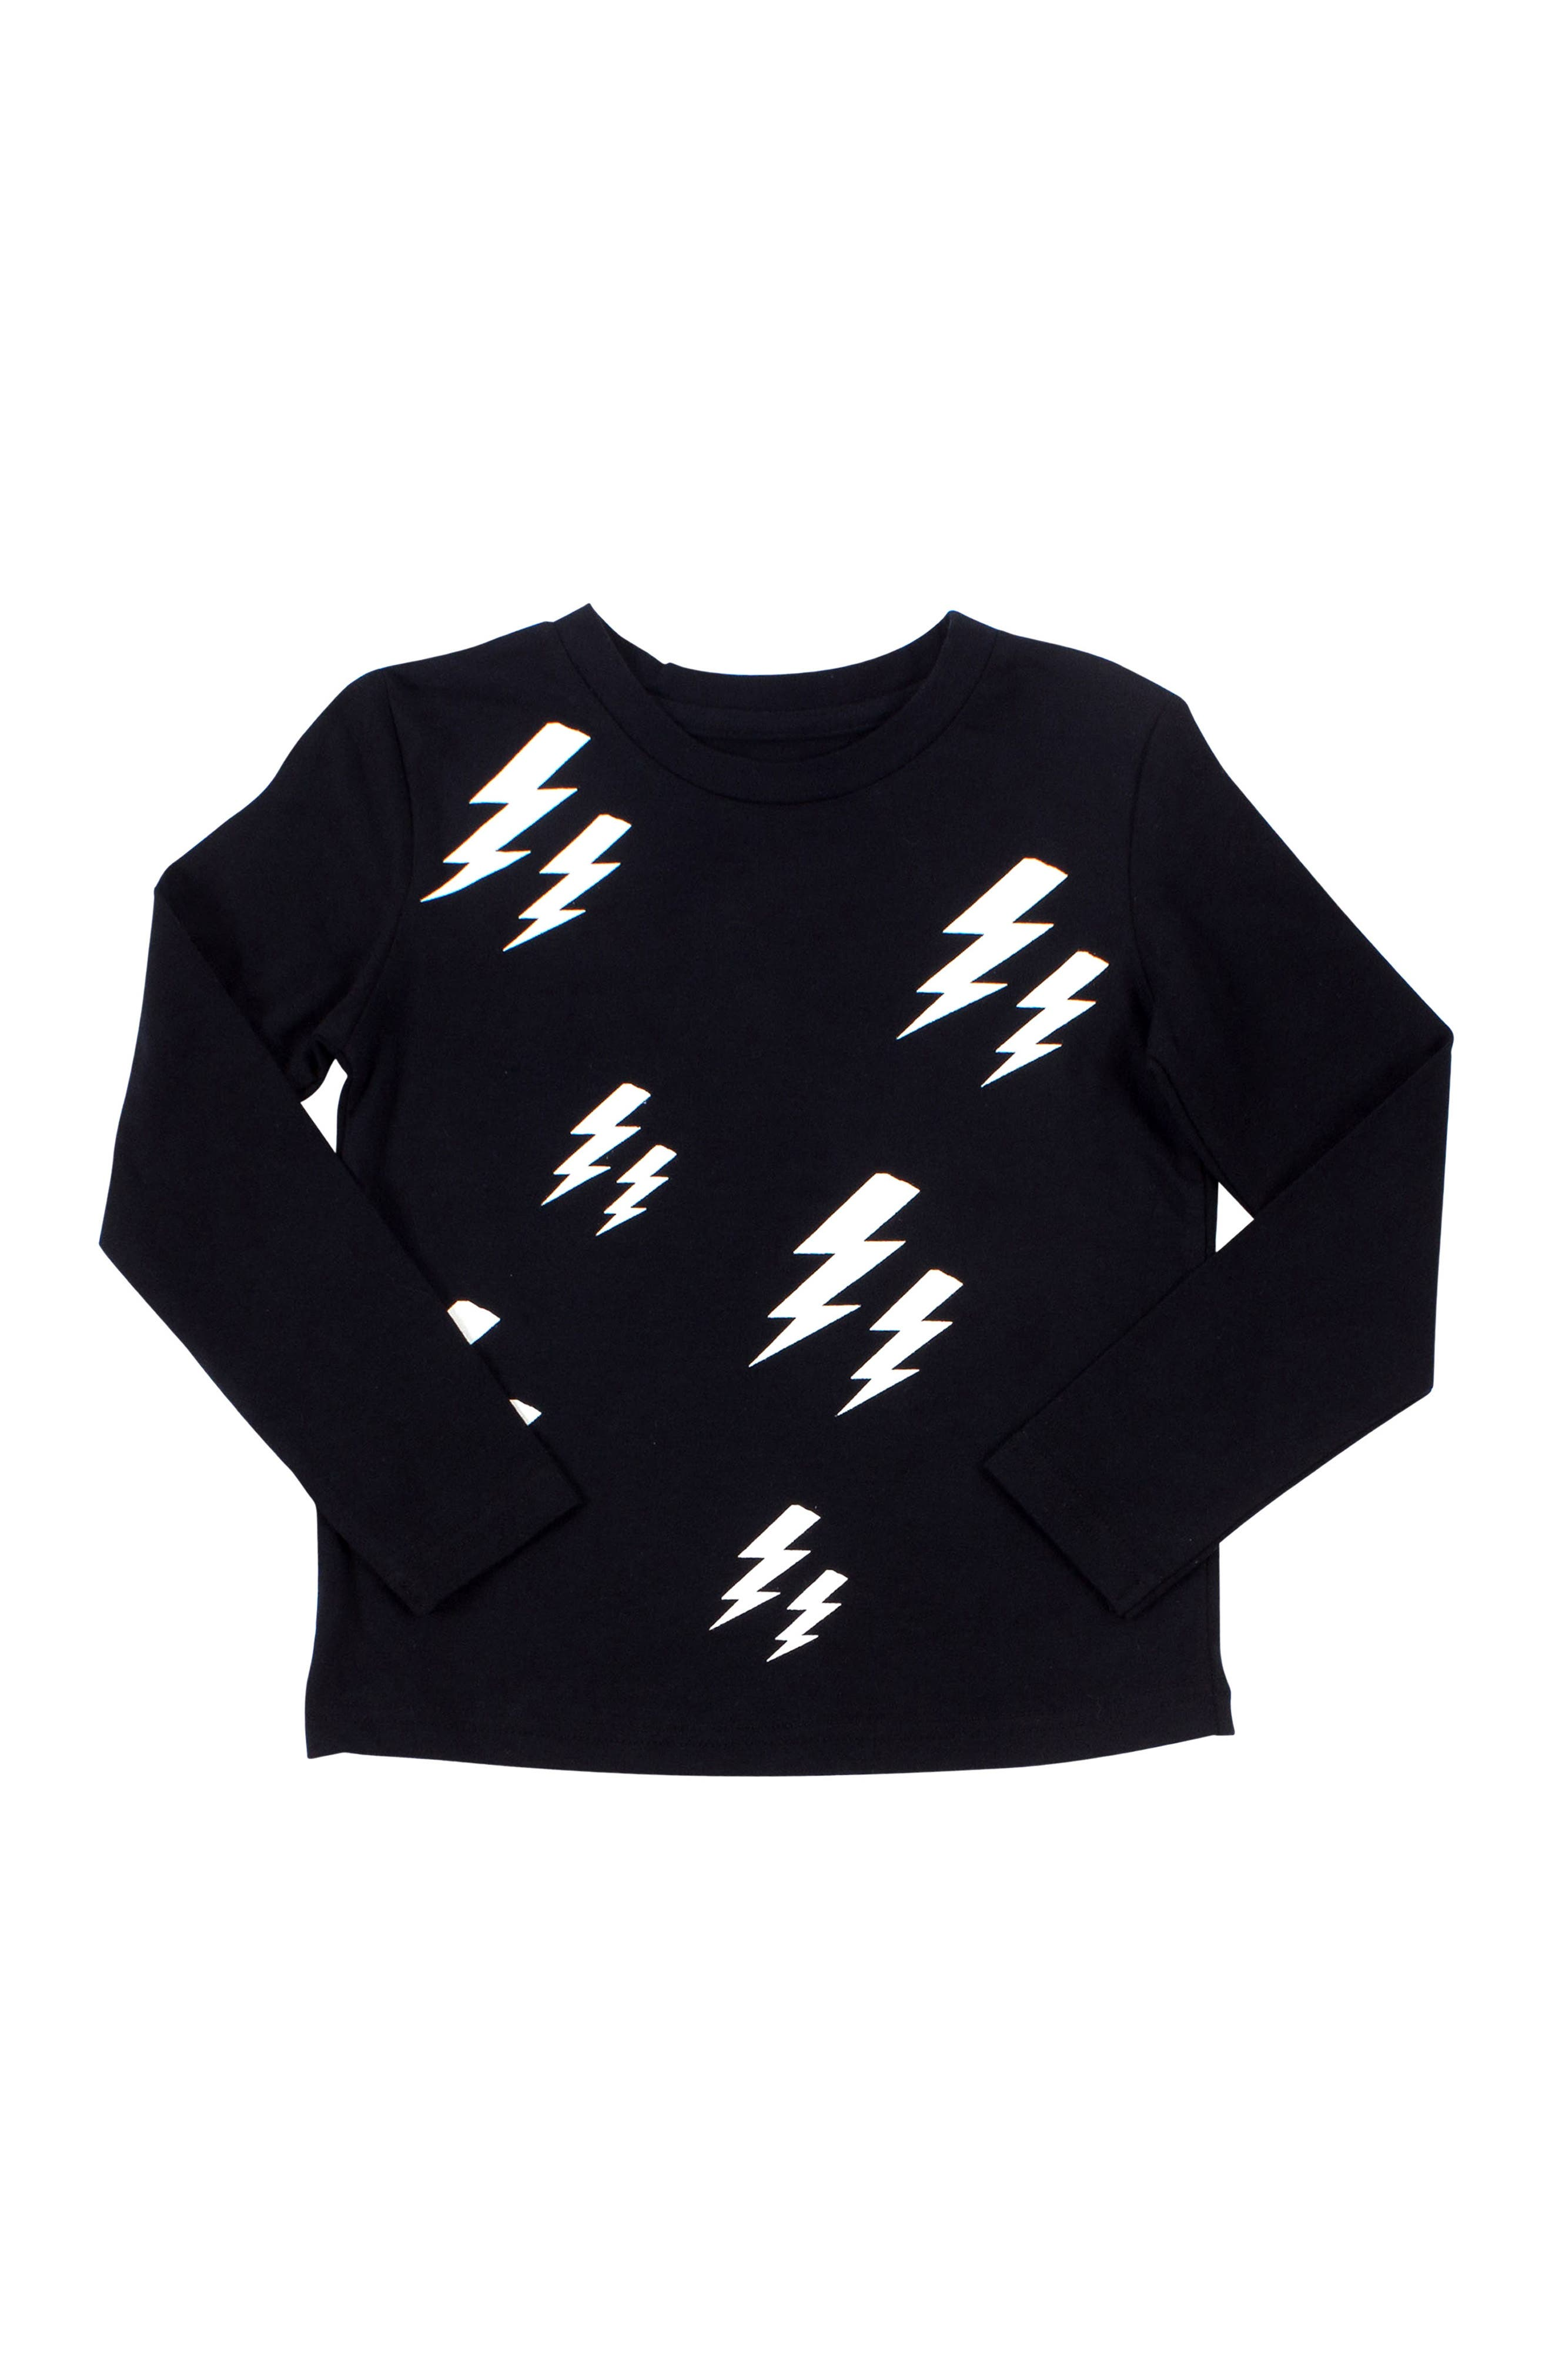 Lightning T-Shirt,                             Main thumbnail 1, color,                             001